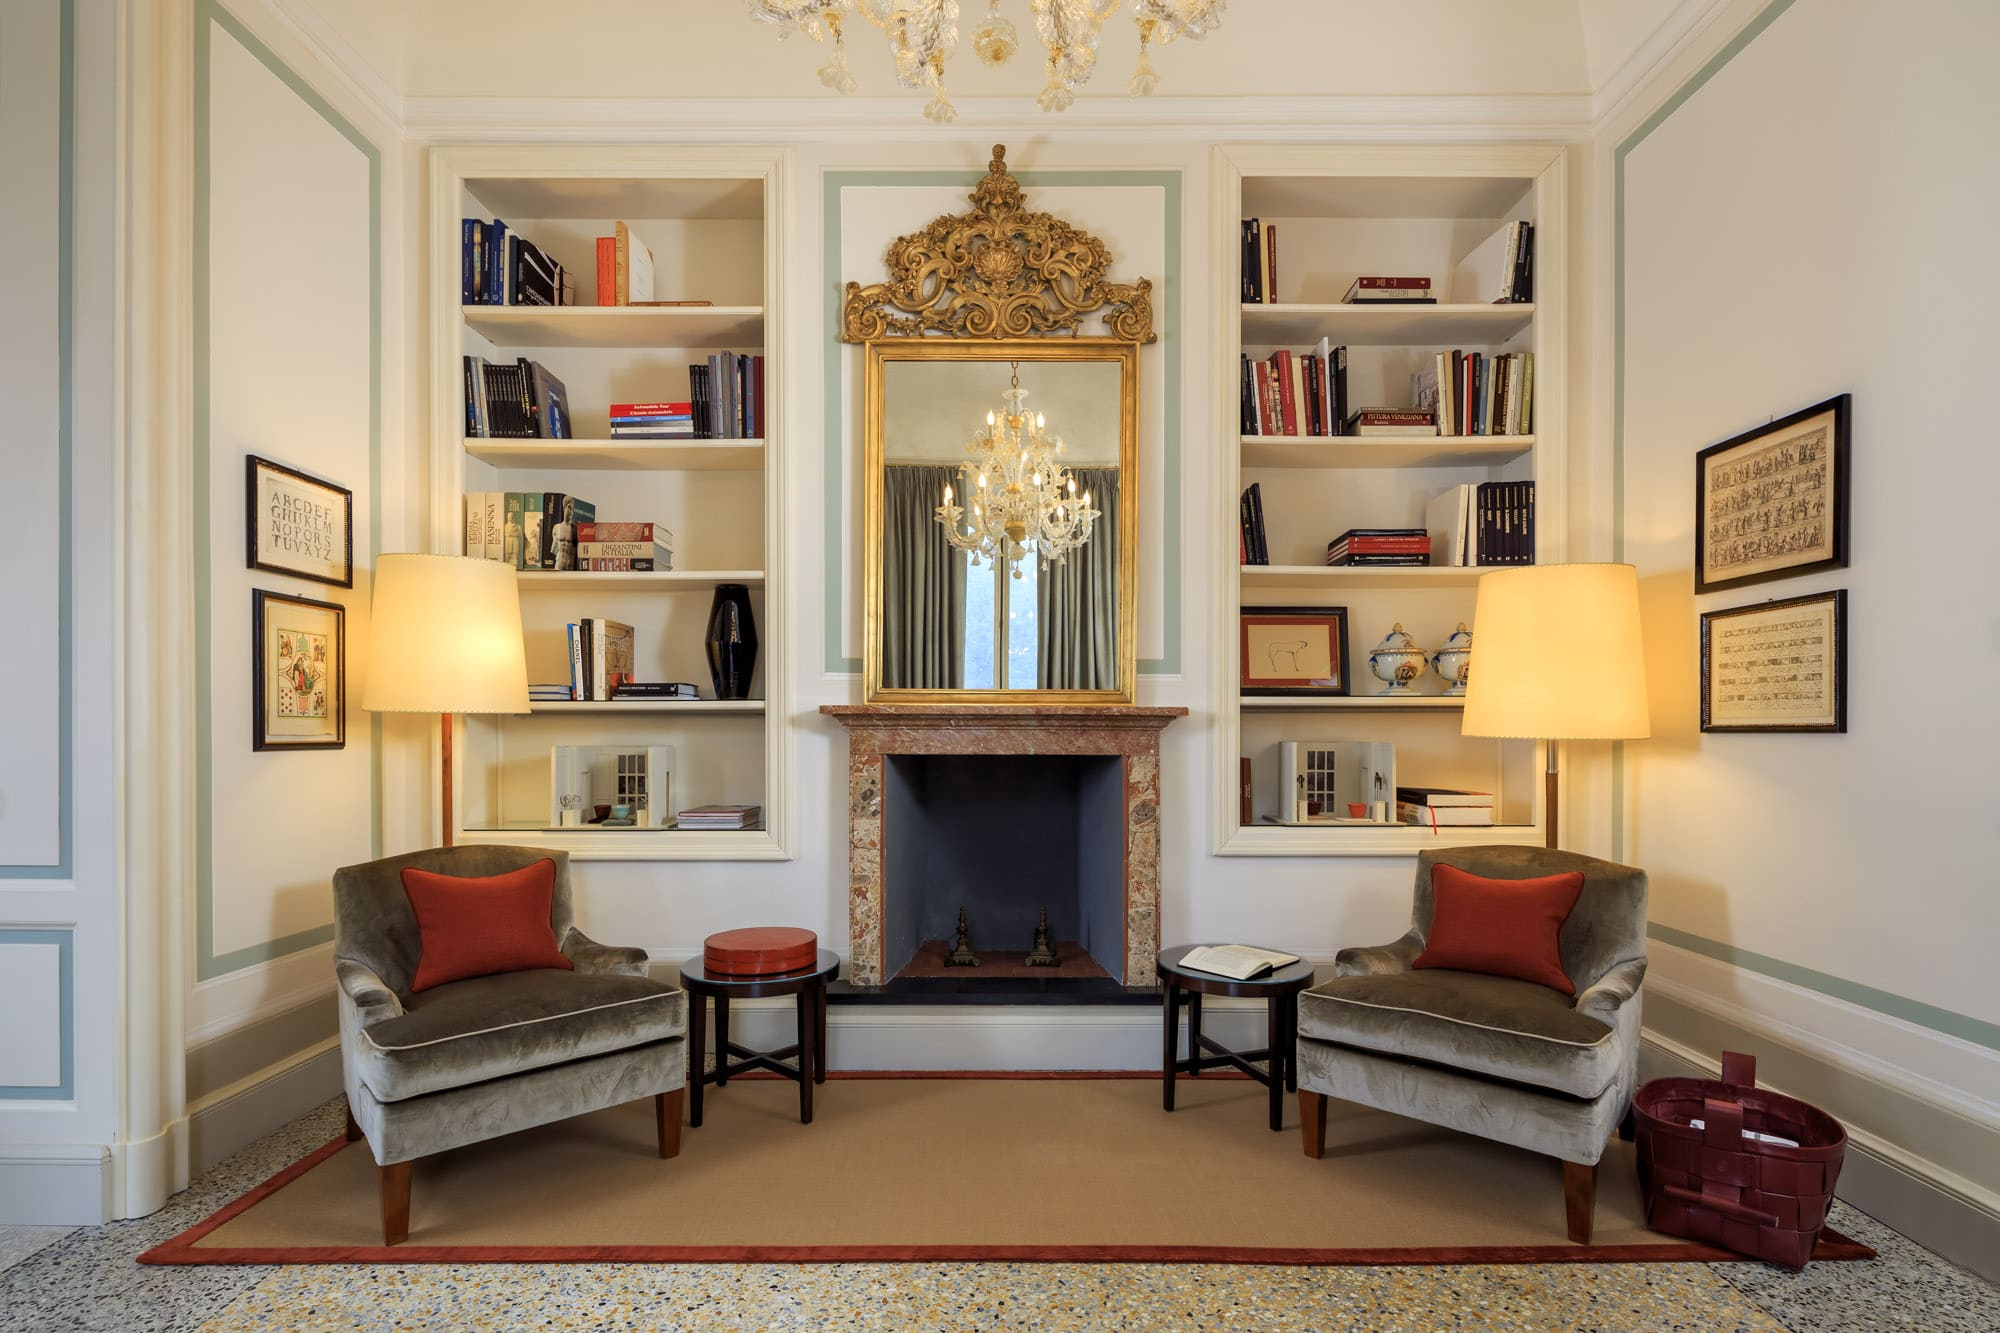 Villa Cima - Mezzanine floor - Sitting room (2)